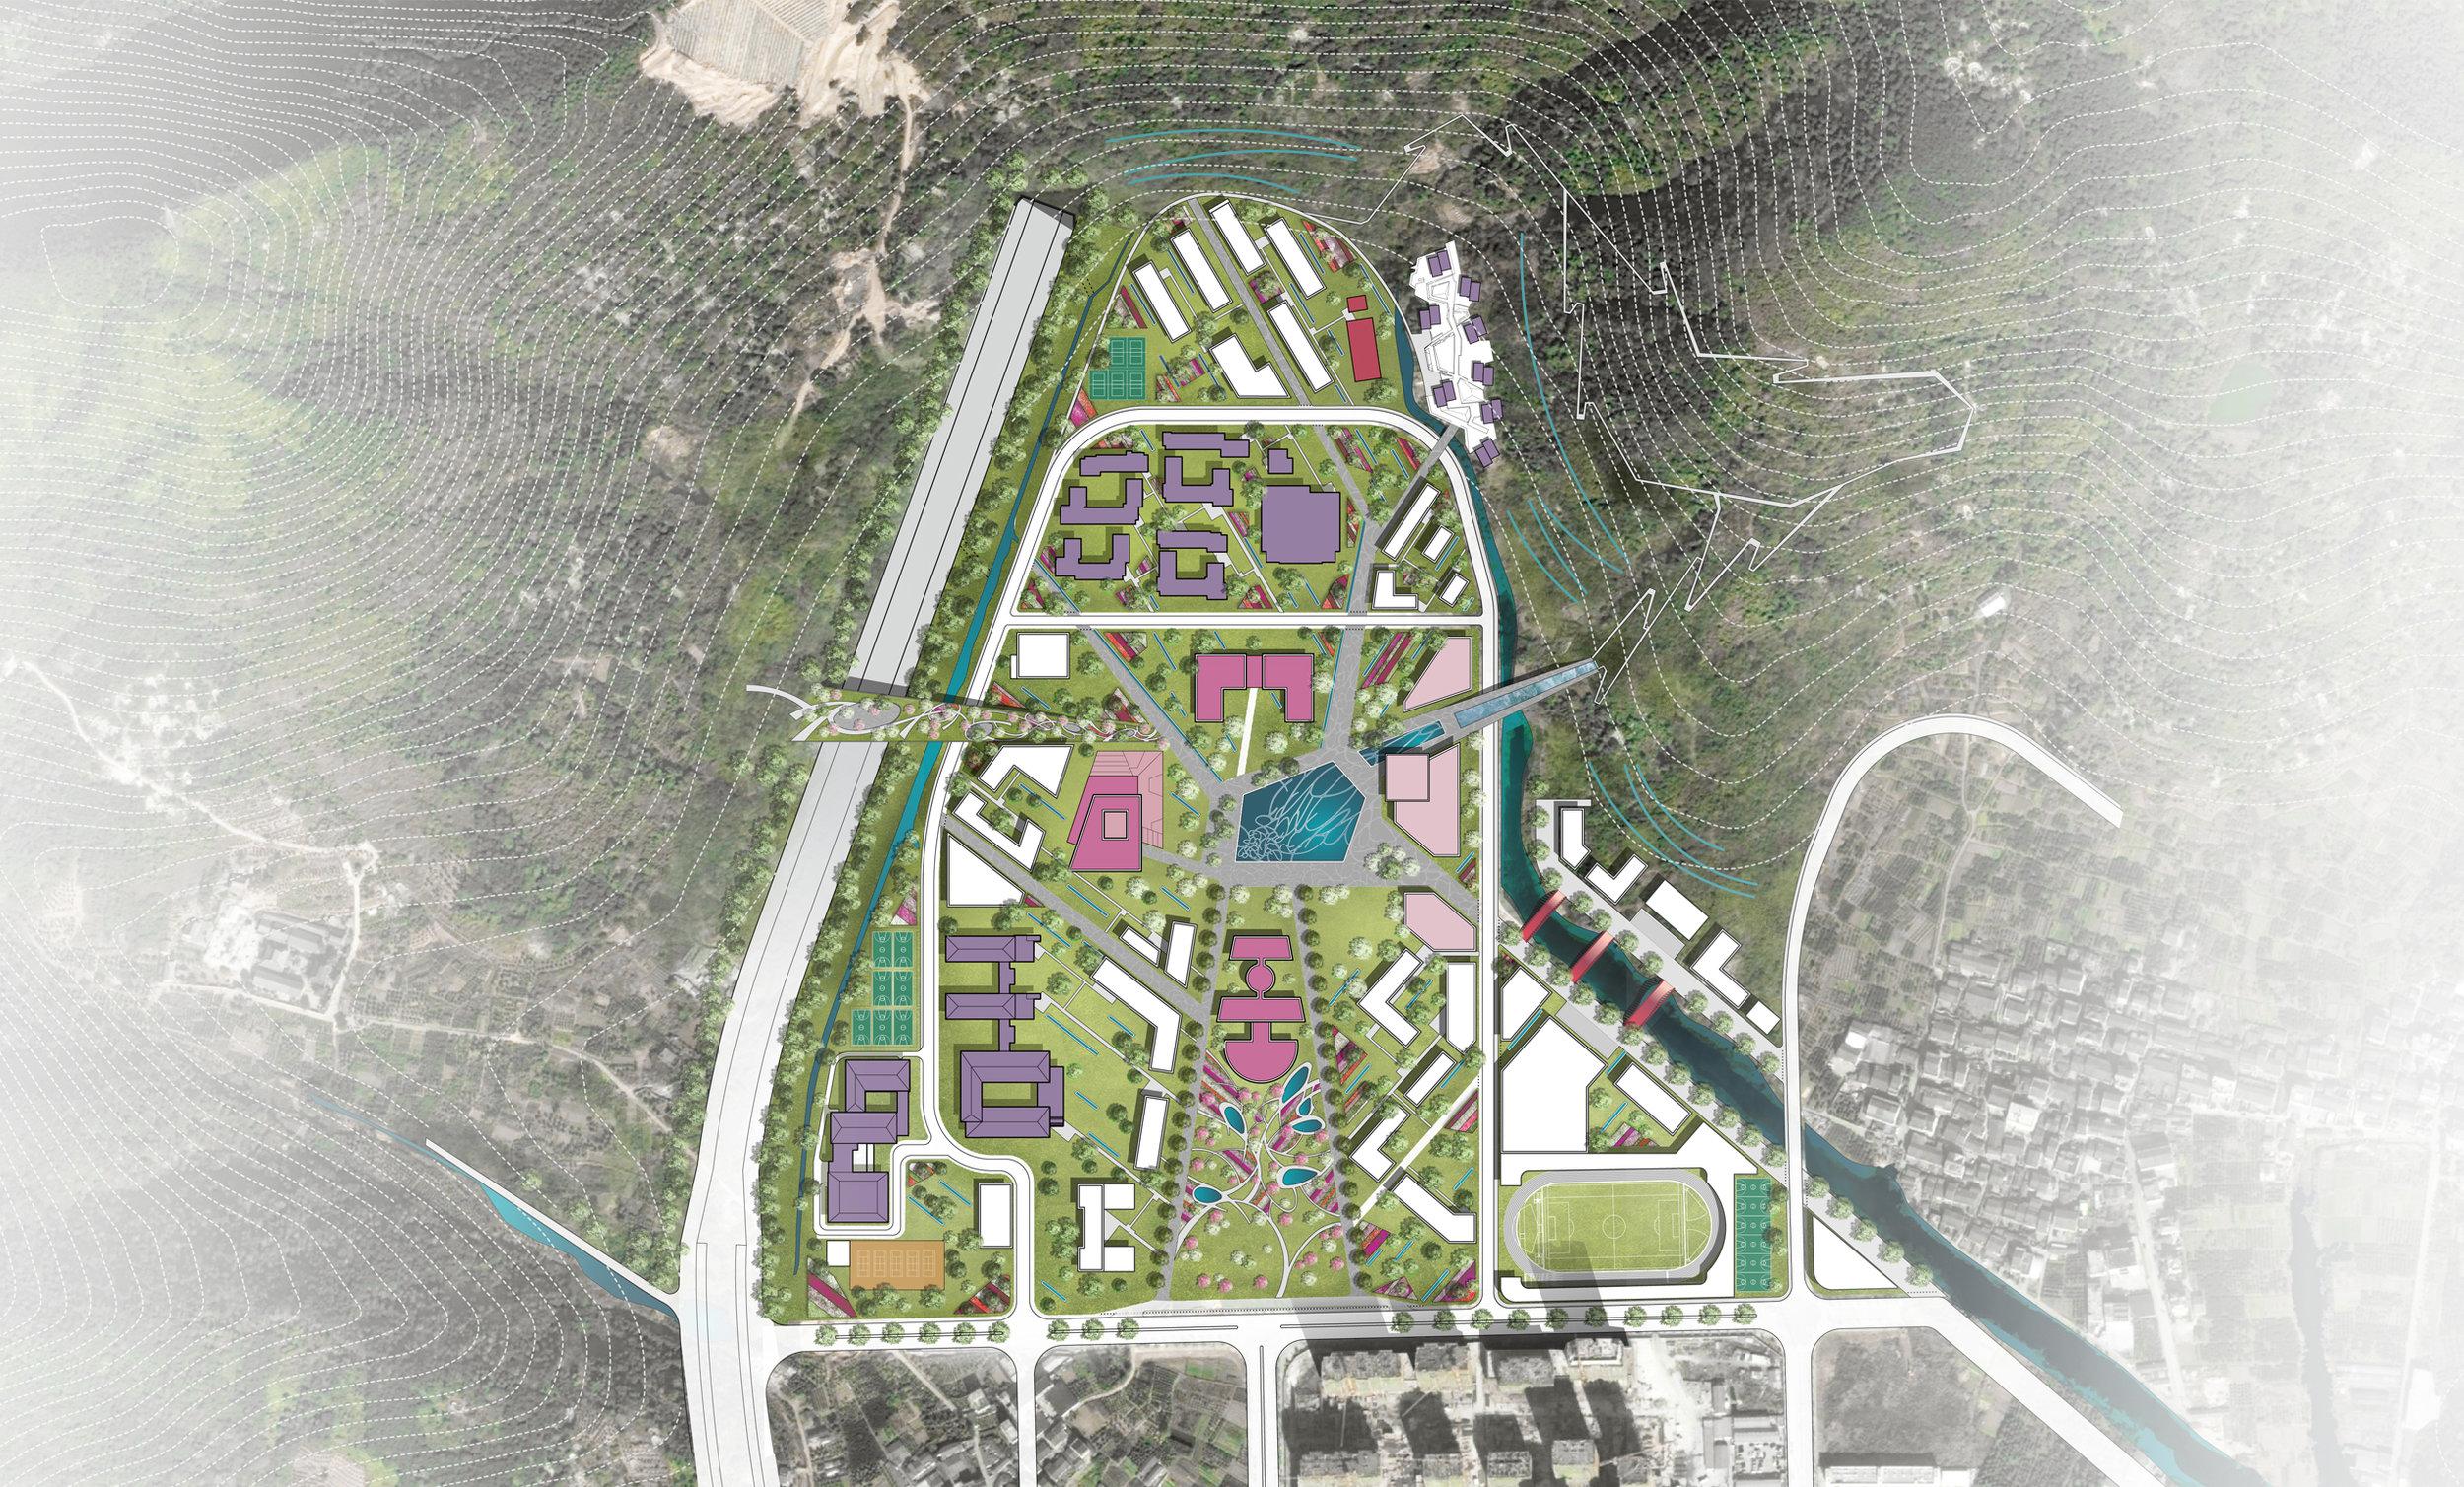 Overall campus masterplan